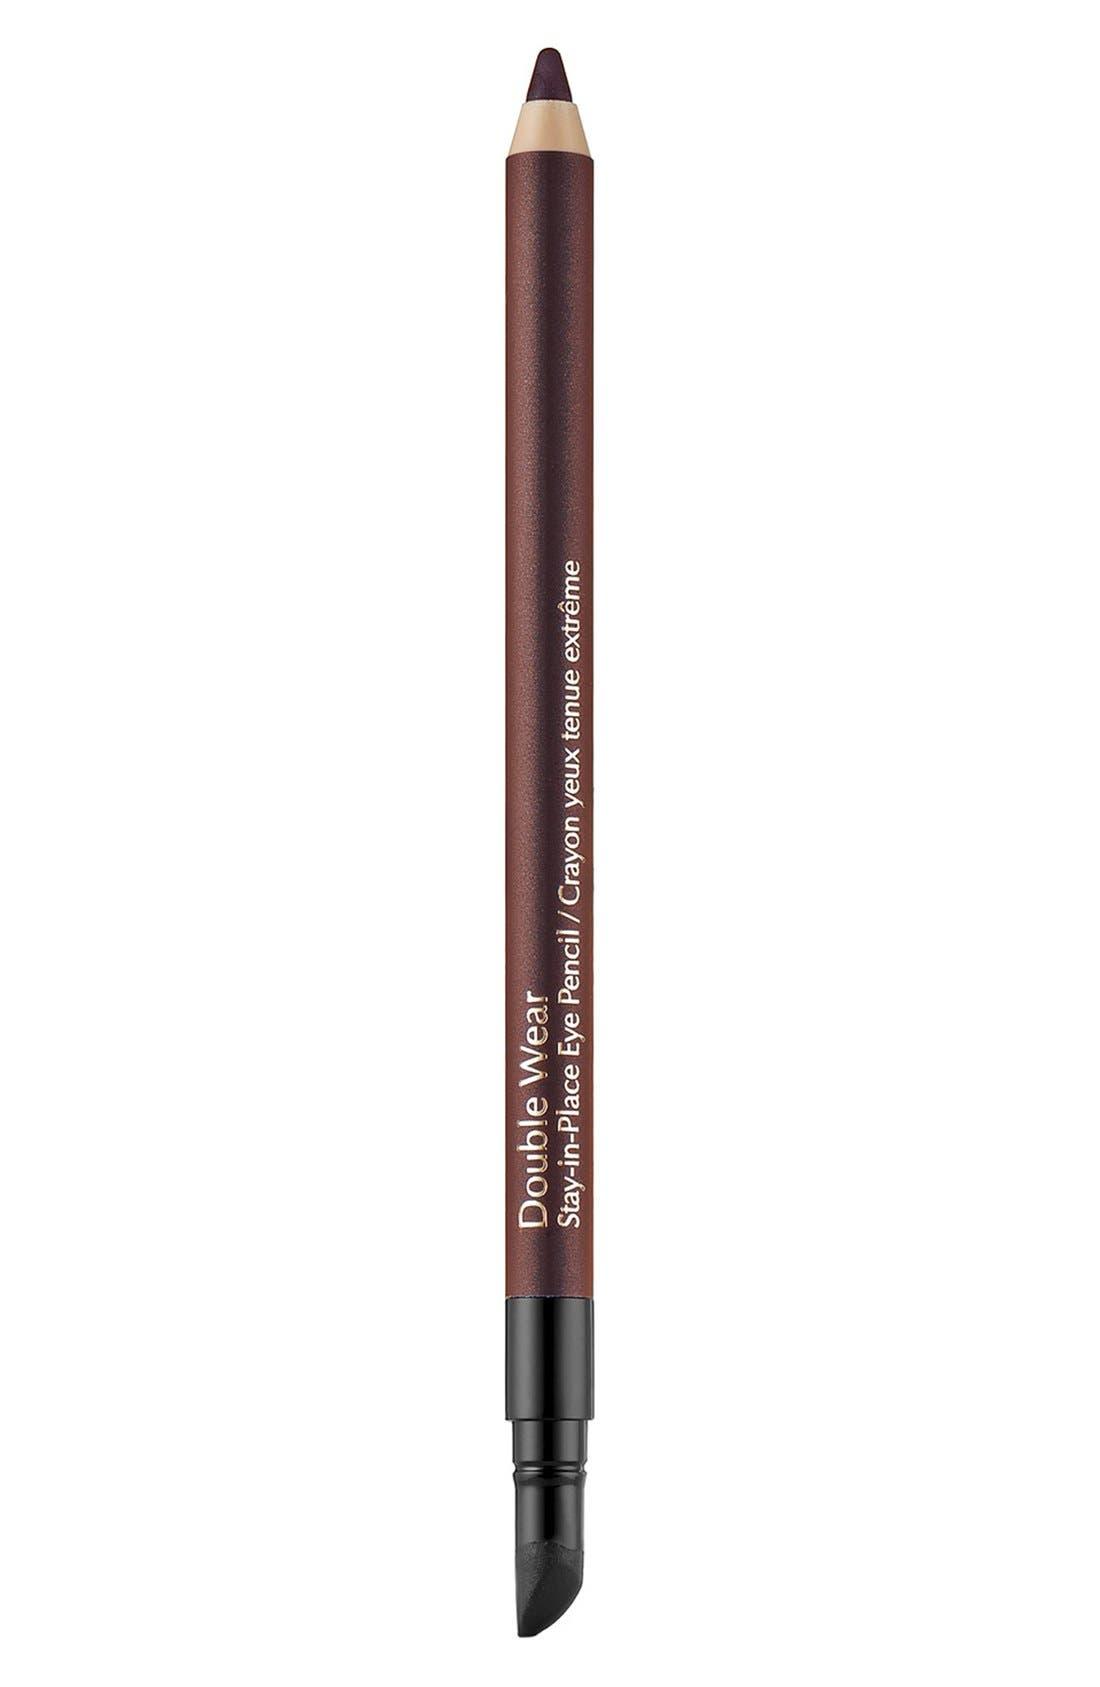 Estee Lauder Double Wear Stay-In-Place Eye Pencil - Burgundy Suede